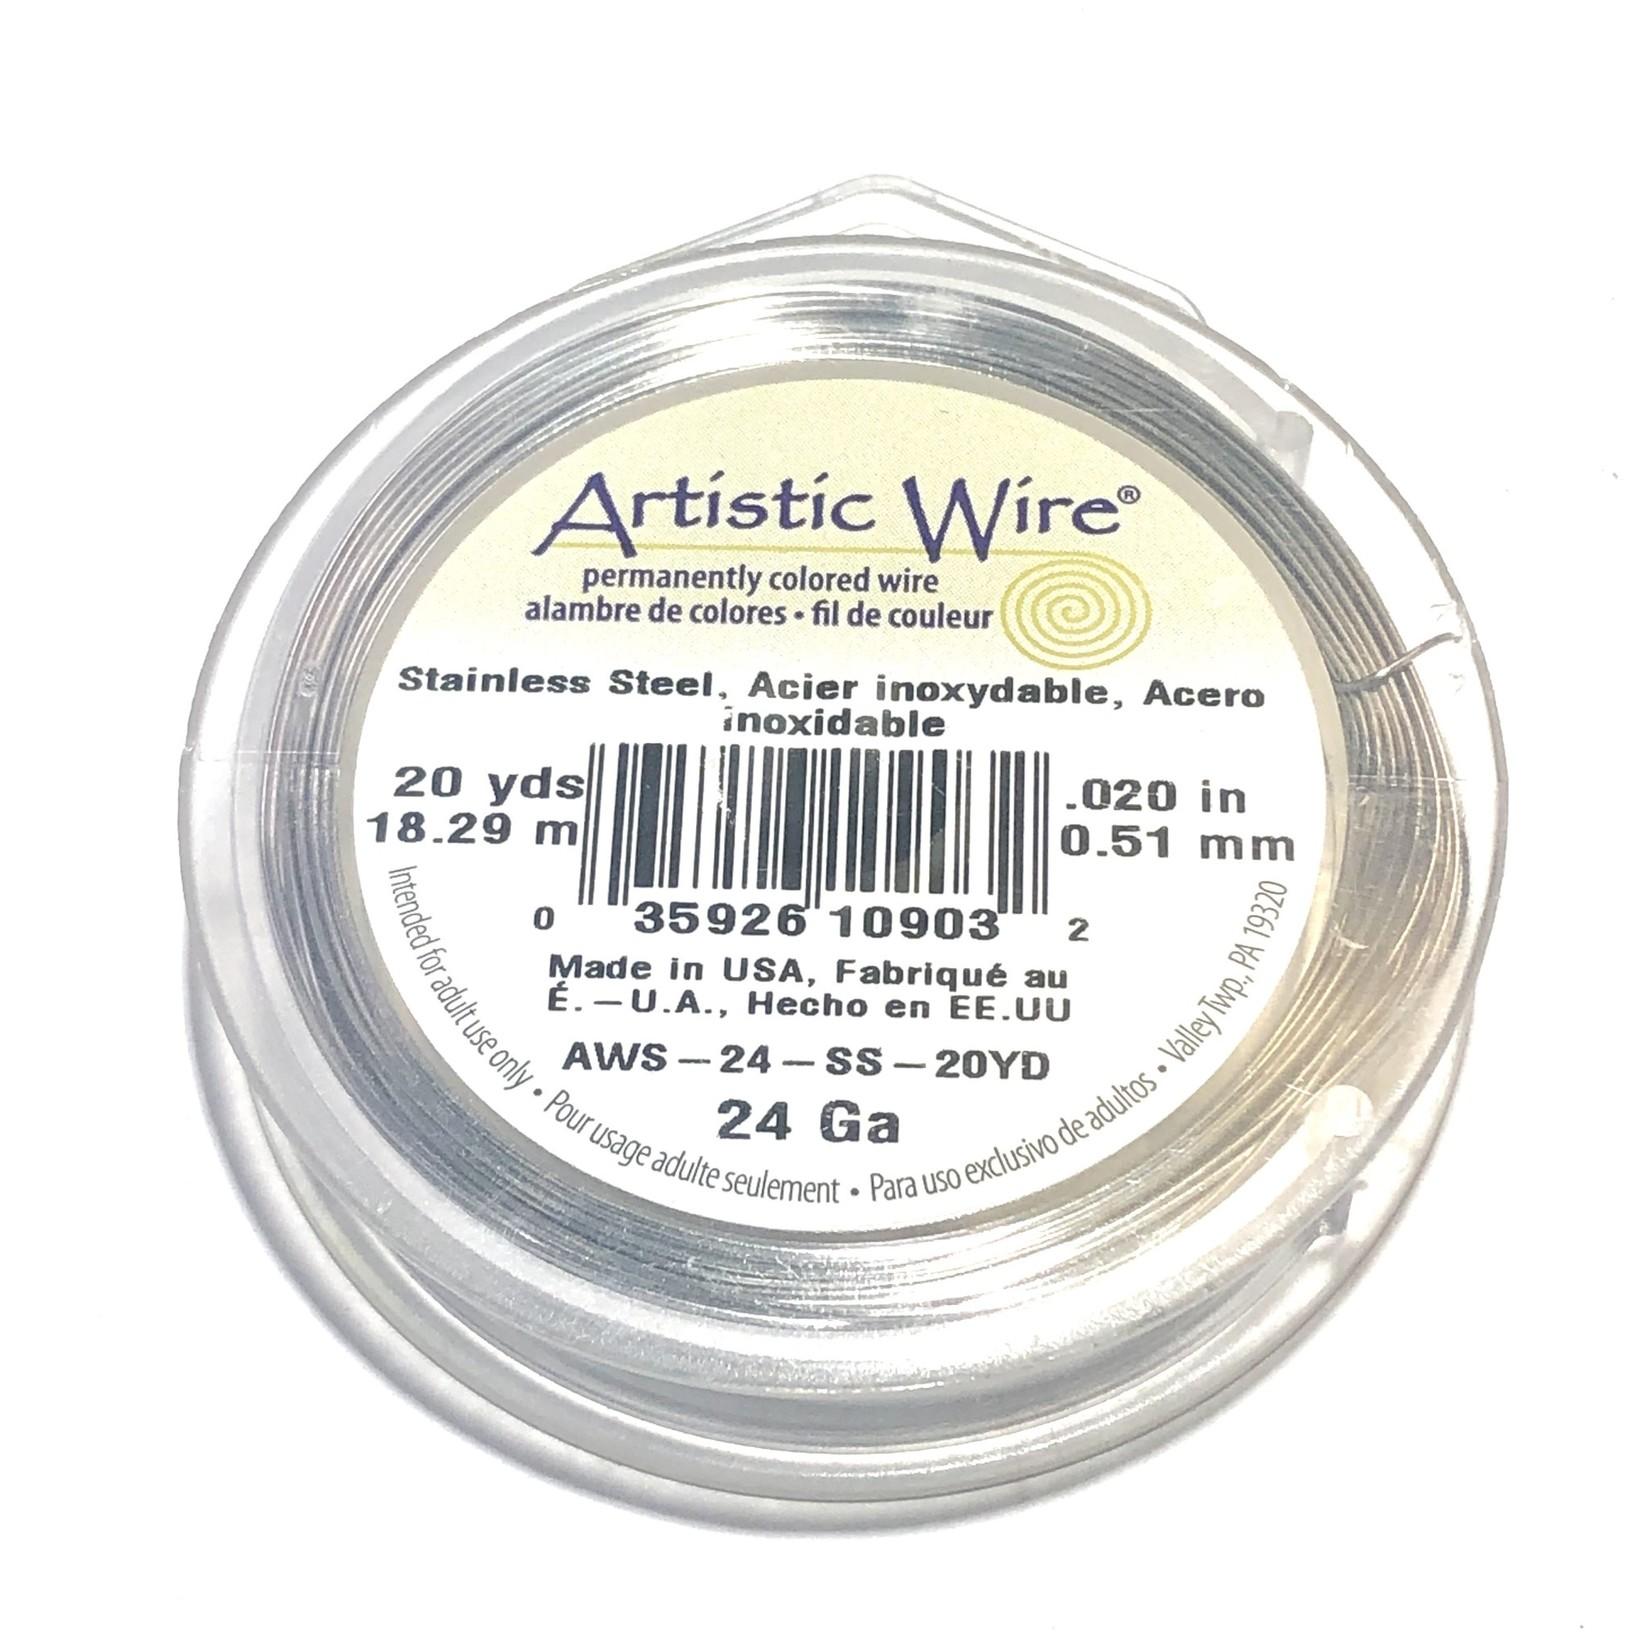 Artistic Wire Stainless Steel 24 Gauge 20 Yd